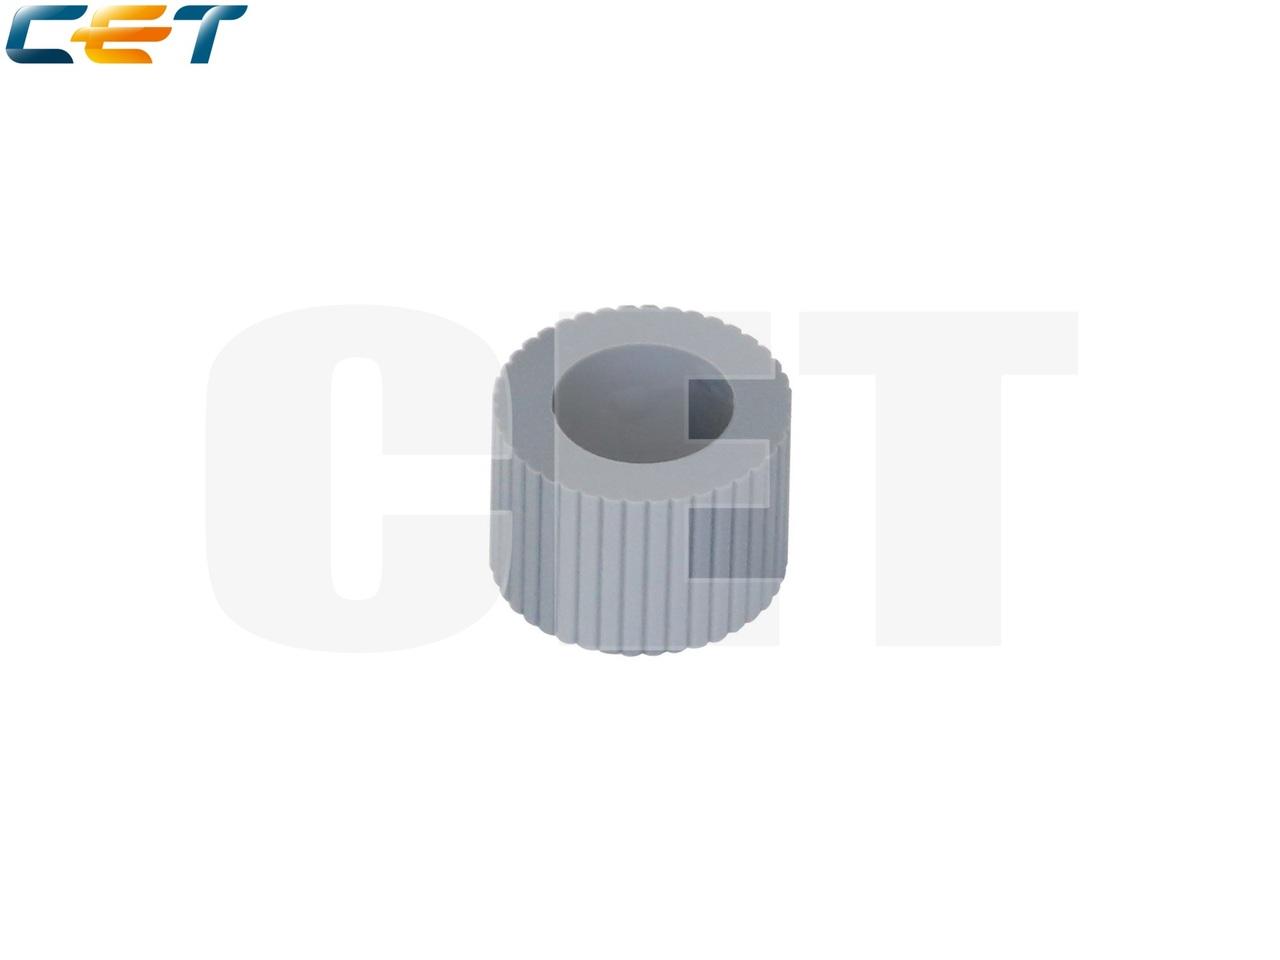 Резинка ролика подхвата, верхняя PA03338-K011-Upper дляFUJITSU fi-6670/6770 (CET), CET341015